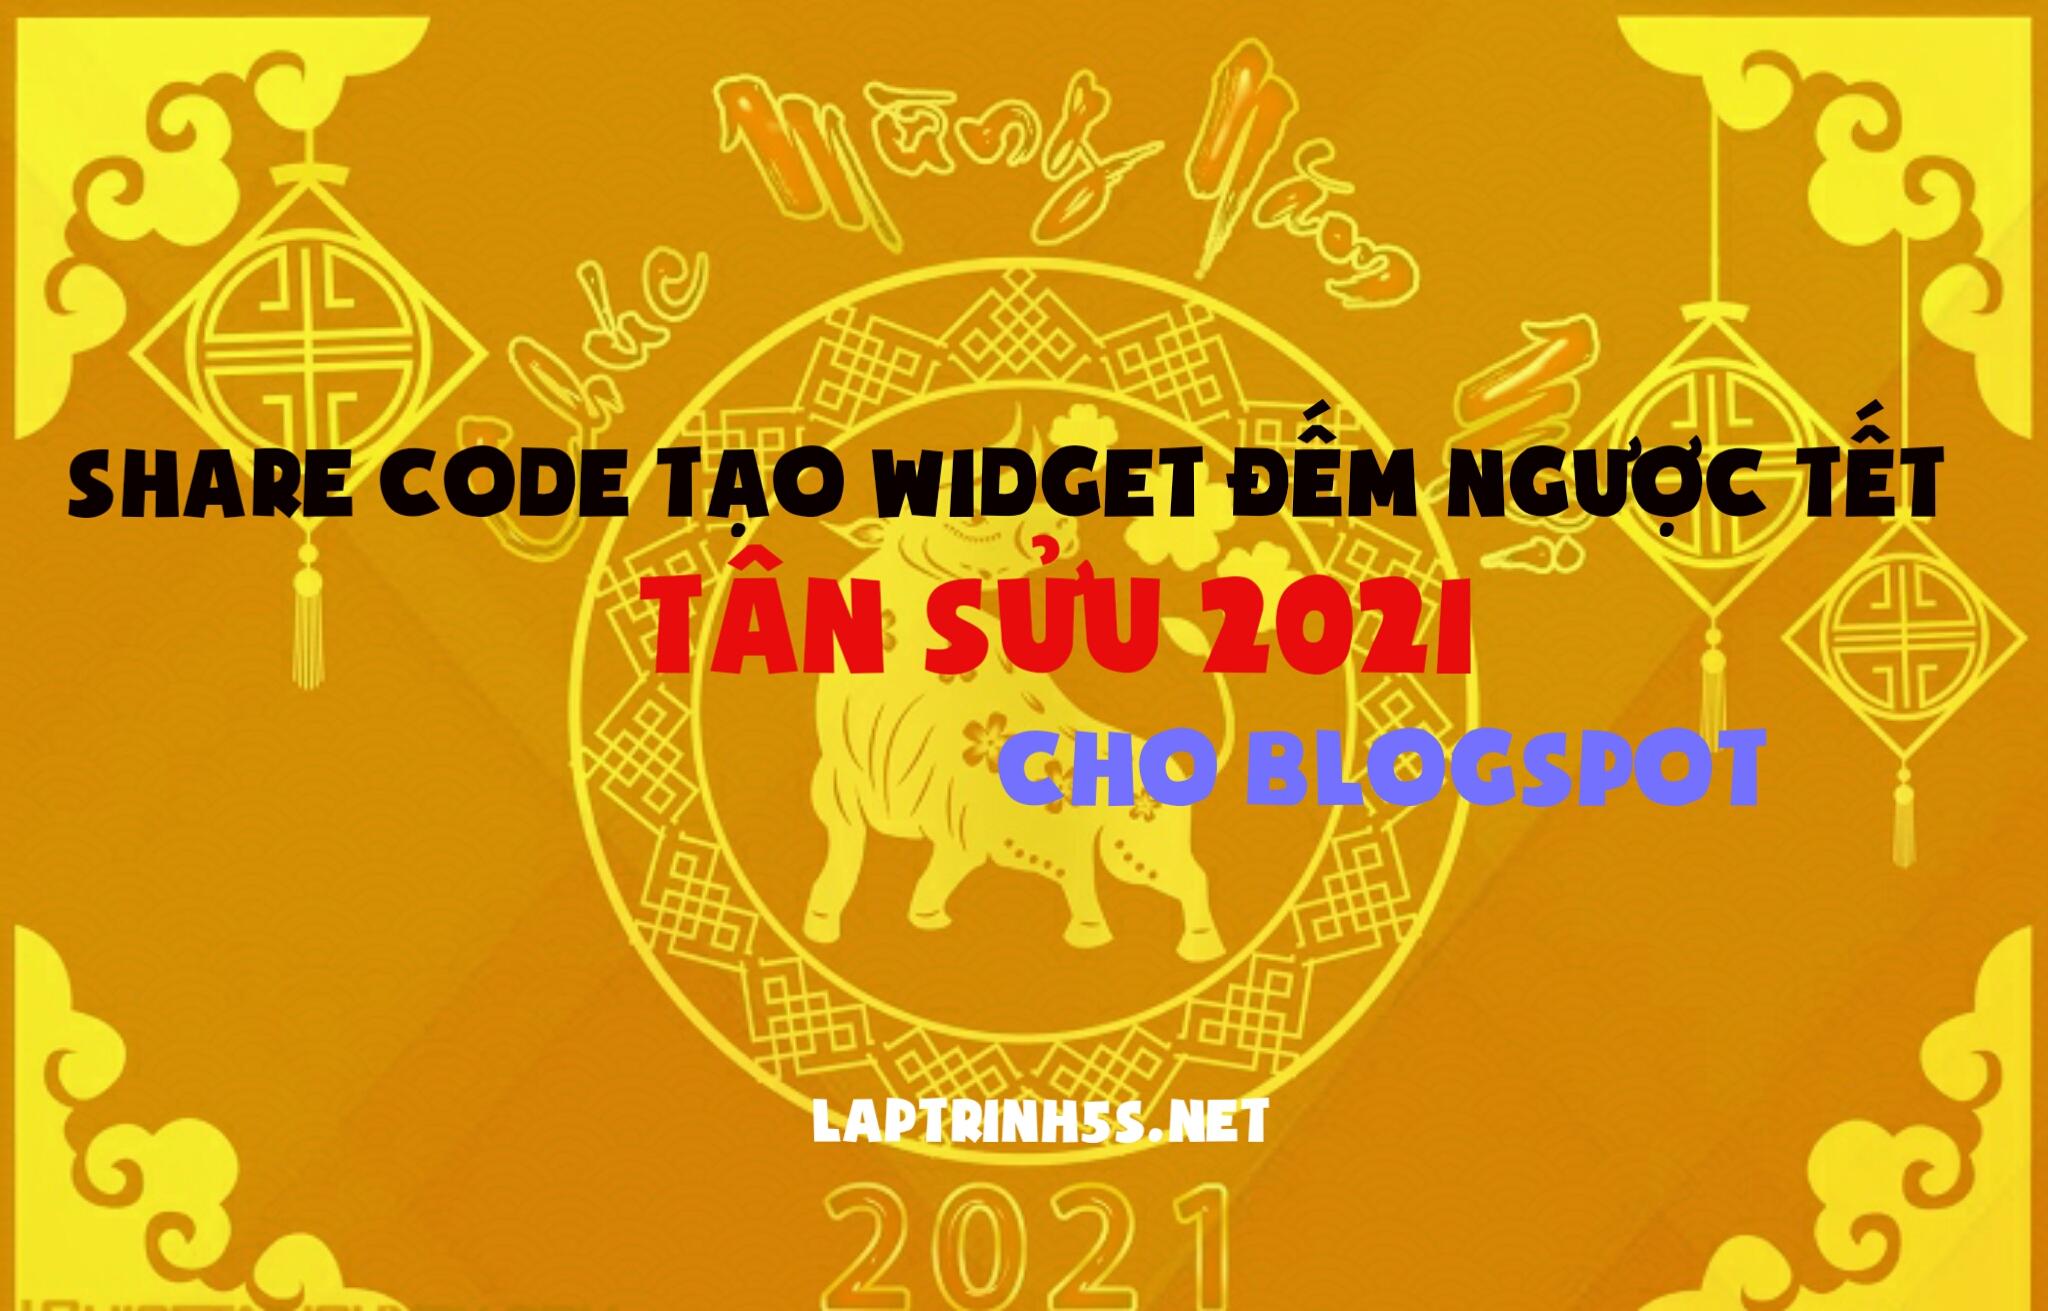 tao widget dem nguoc tet 2021 cho blogspot